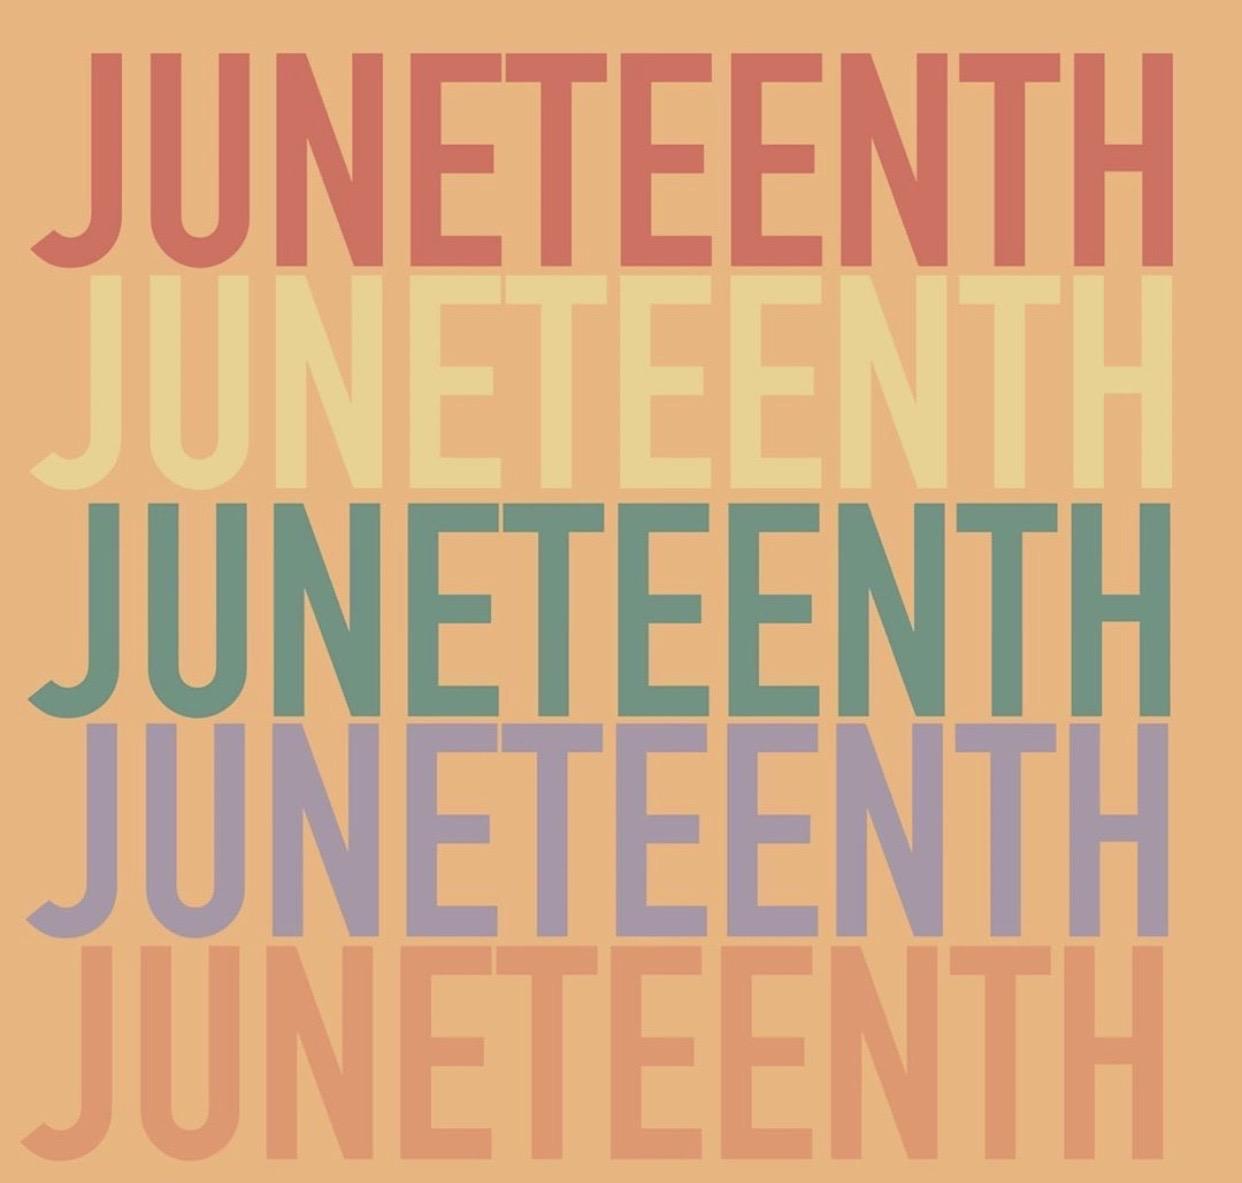 #freetoedit #juneteenth